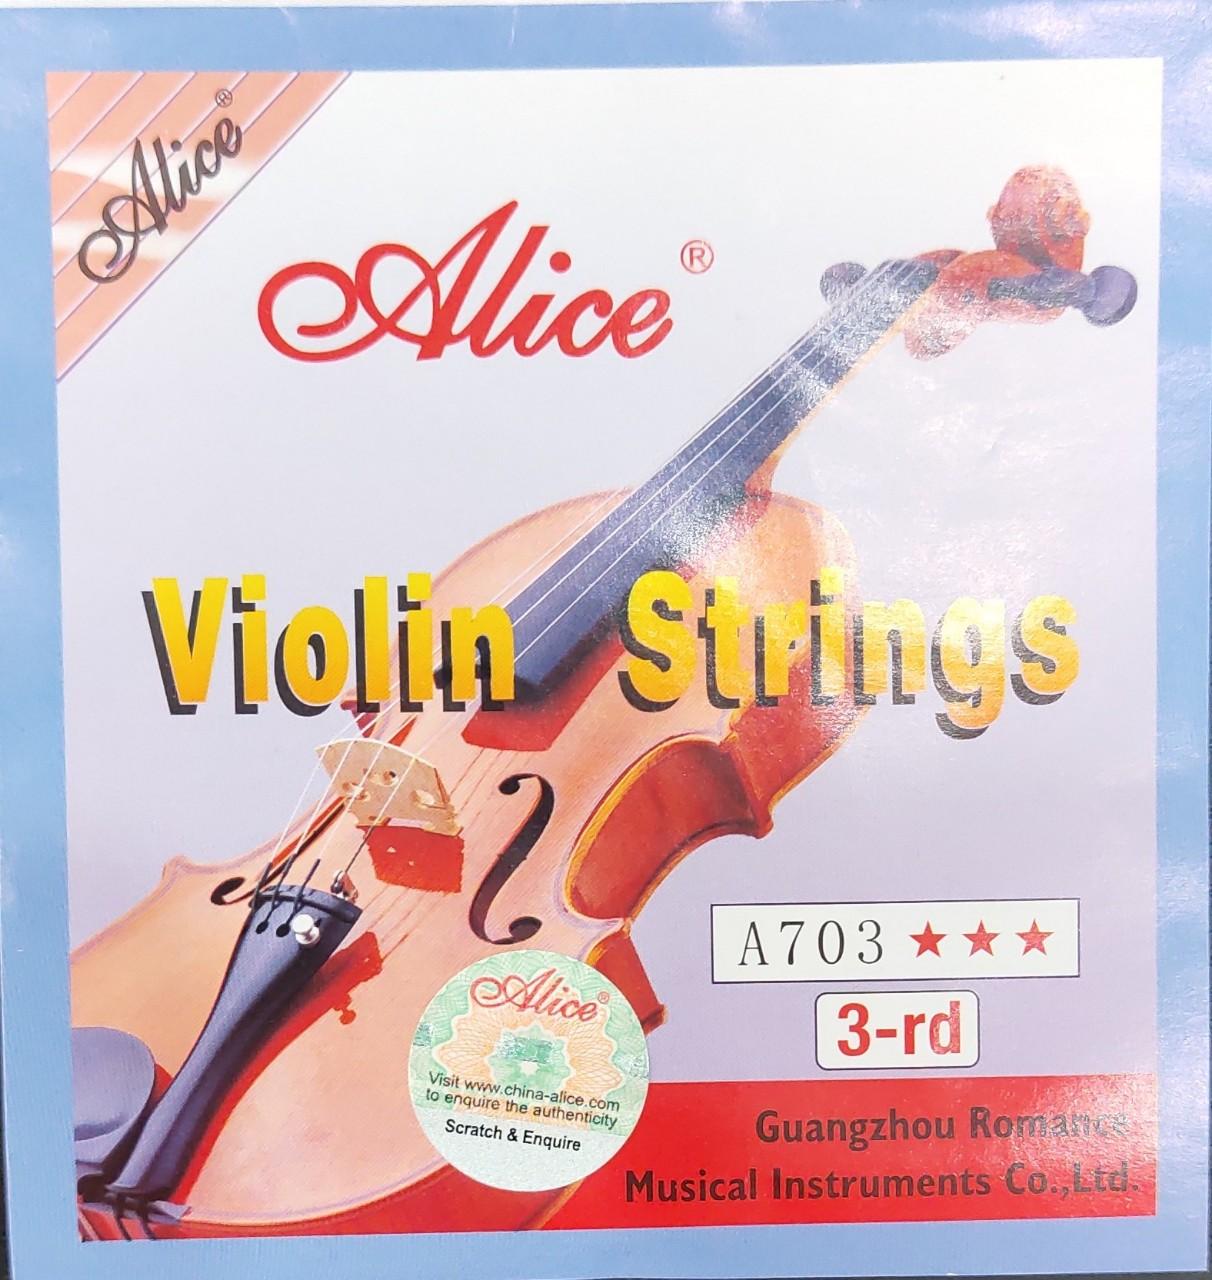 Dây violin lẻ số 3-rd Alice A703